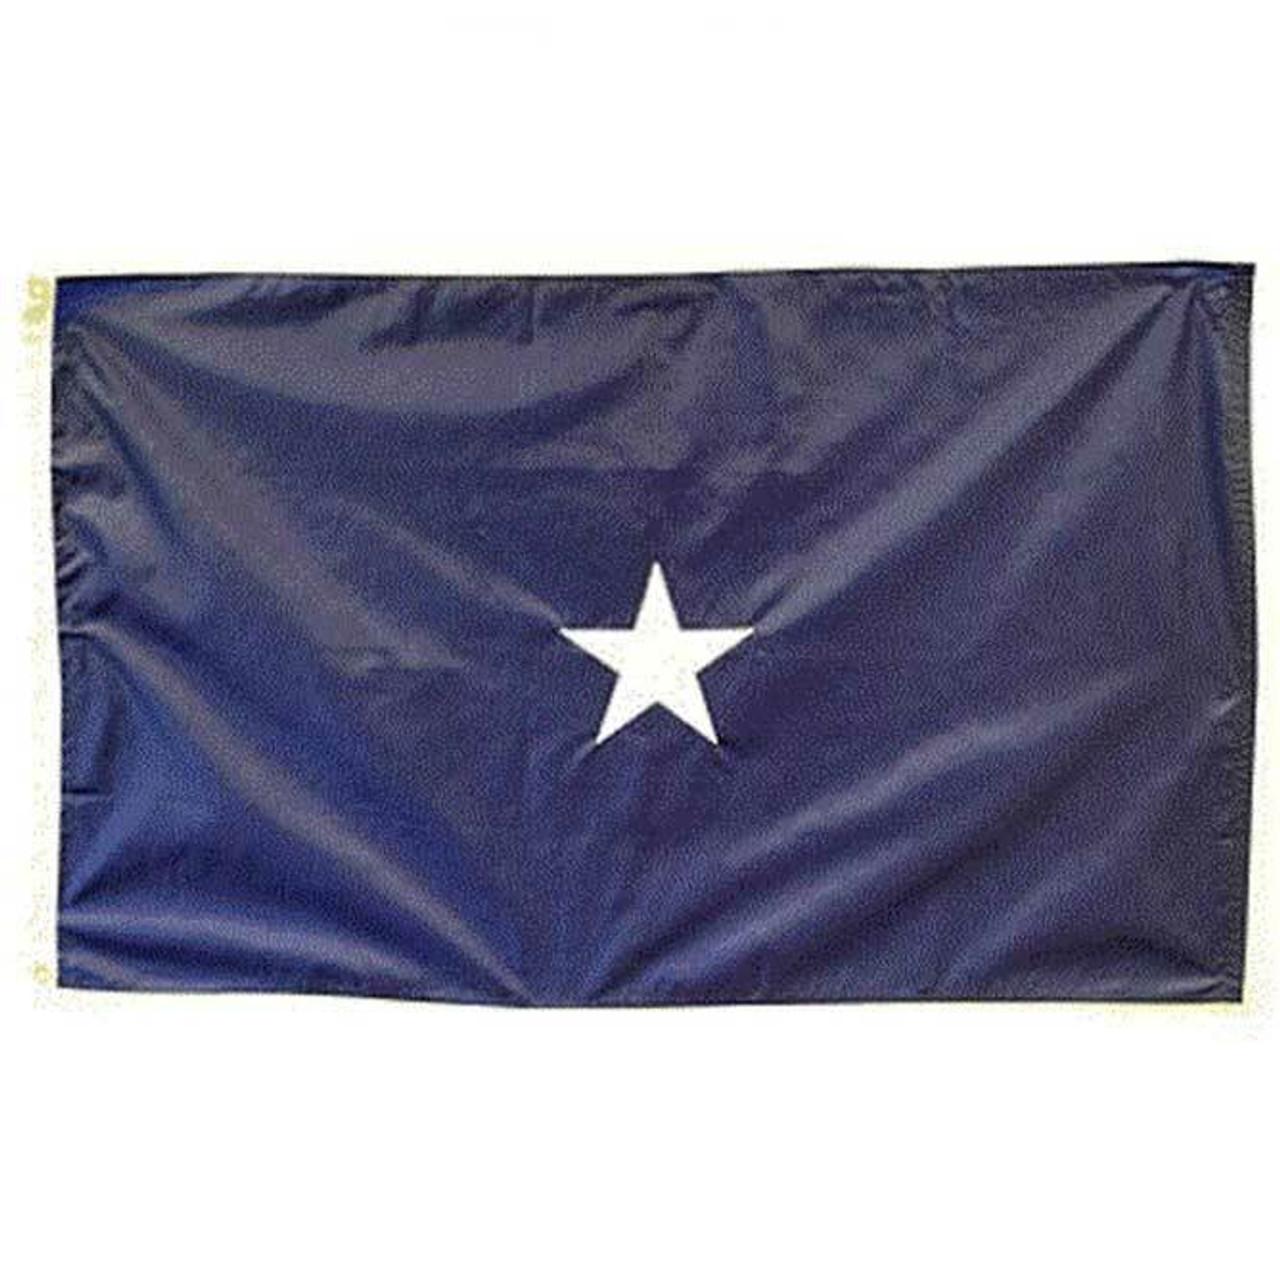 Navy Seagoing 1 Star Officer Flag